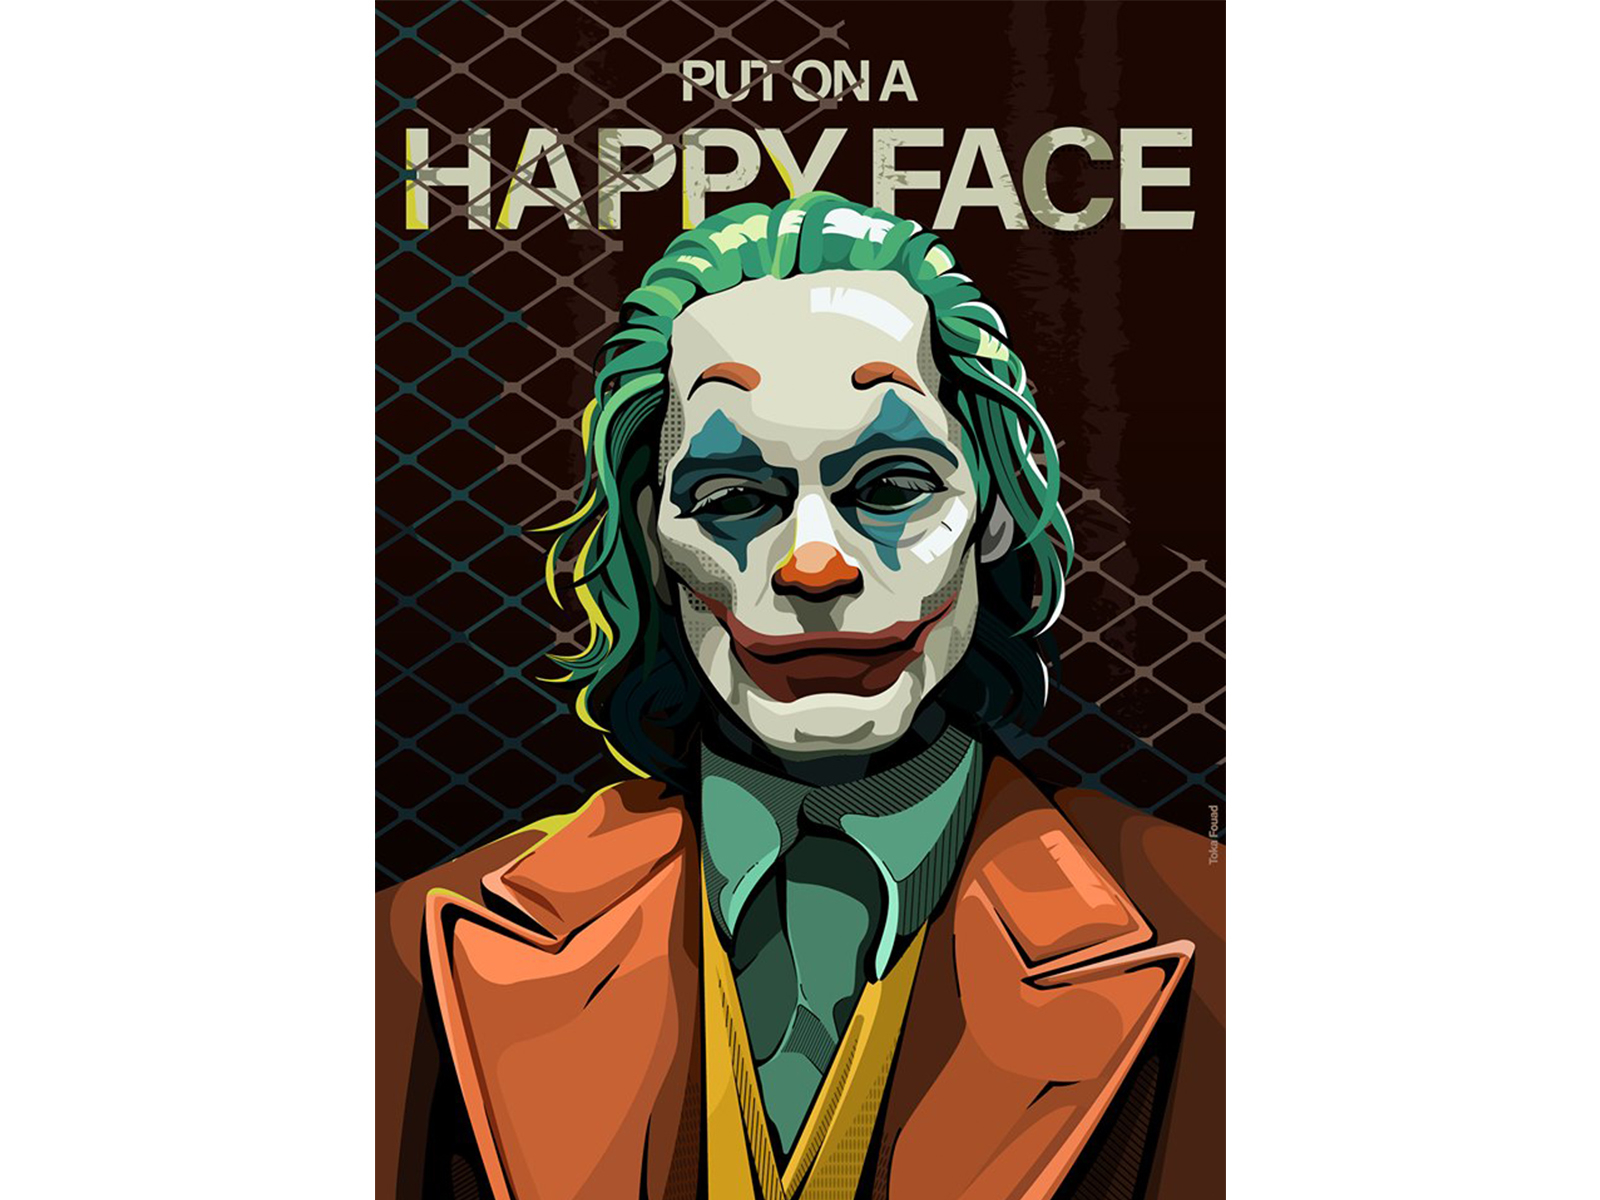 Joker By Toka A Fouad On Dribbble